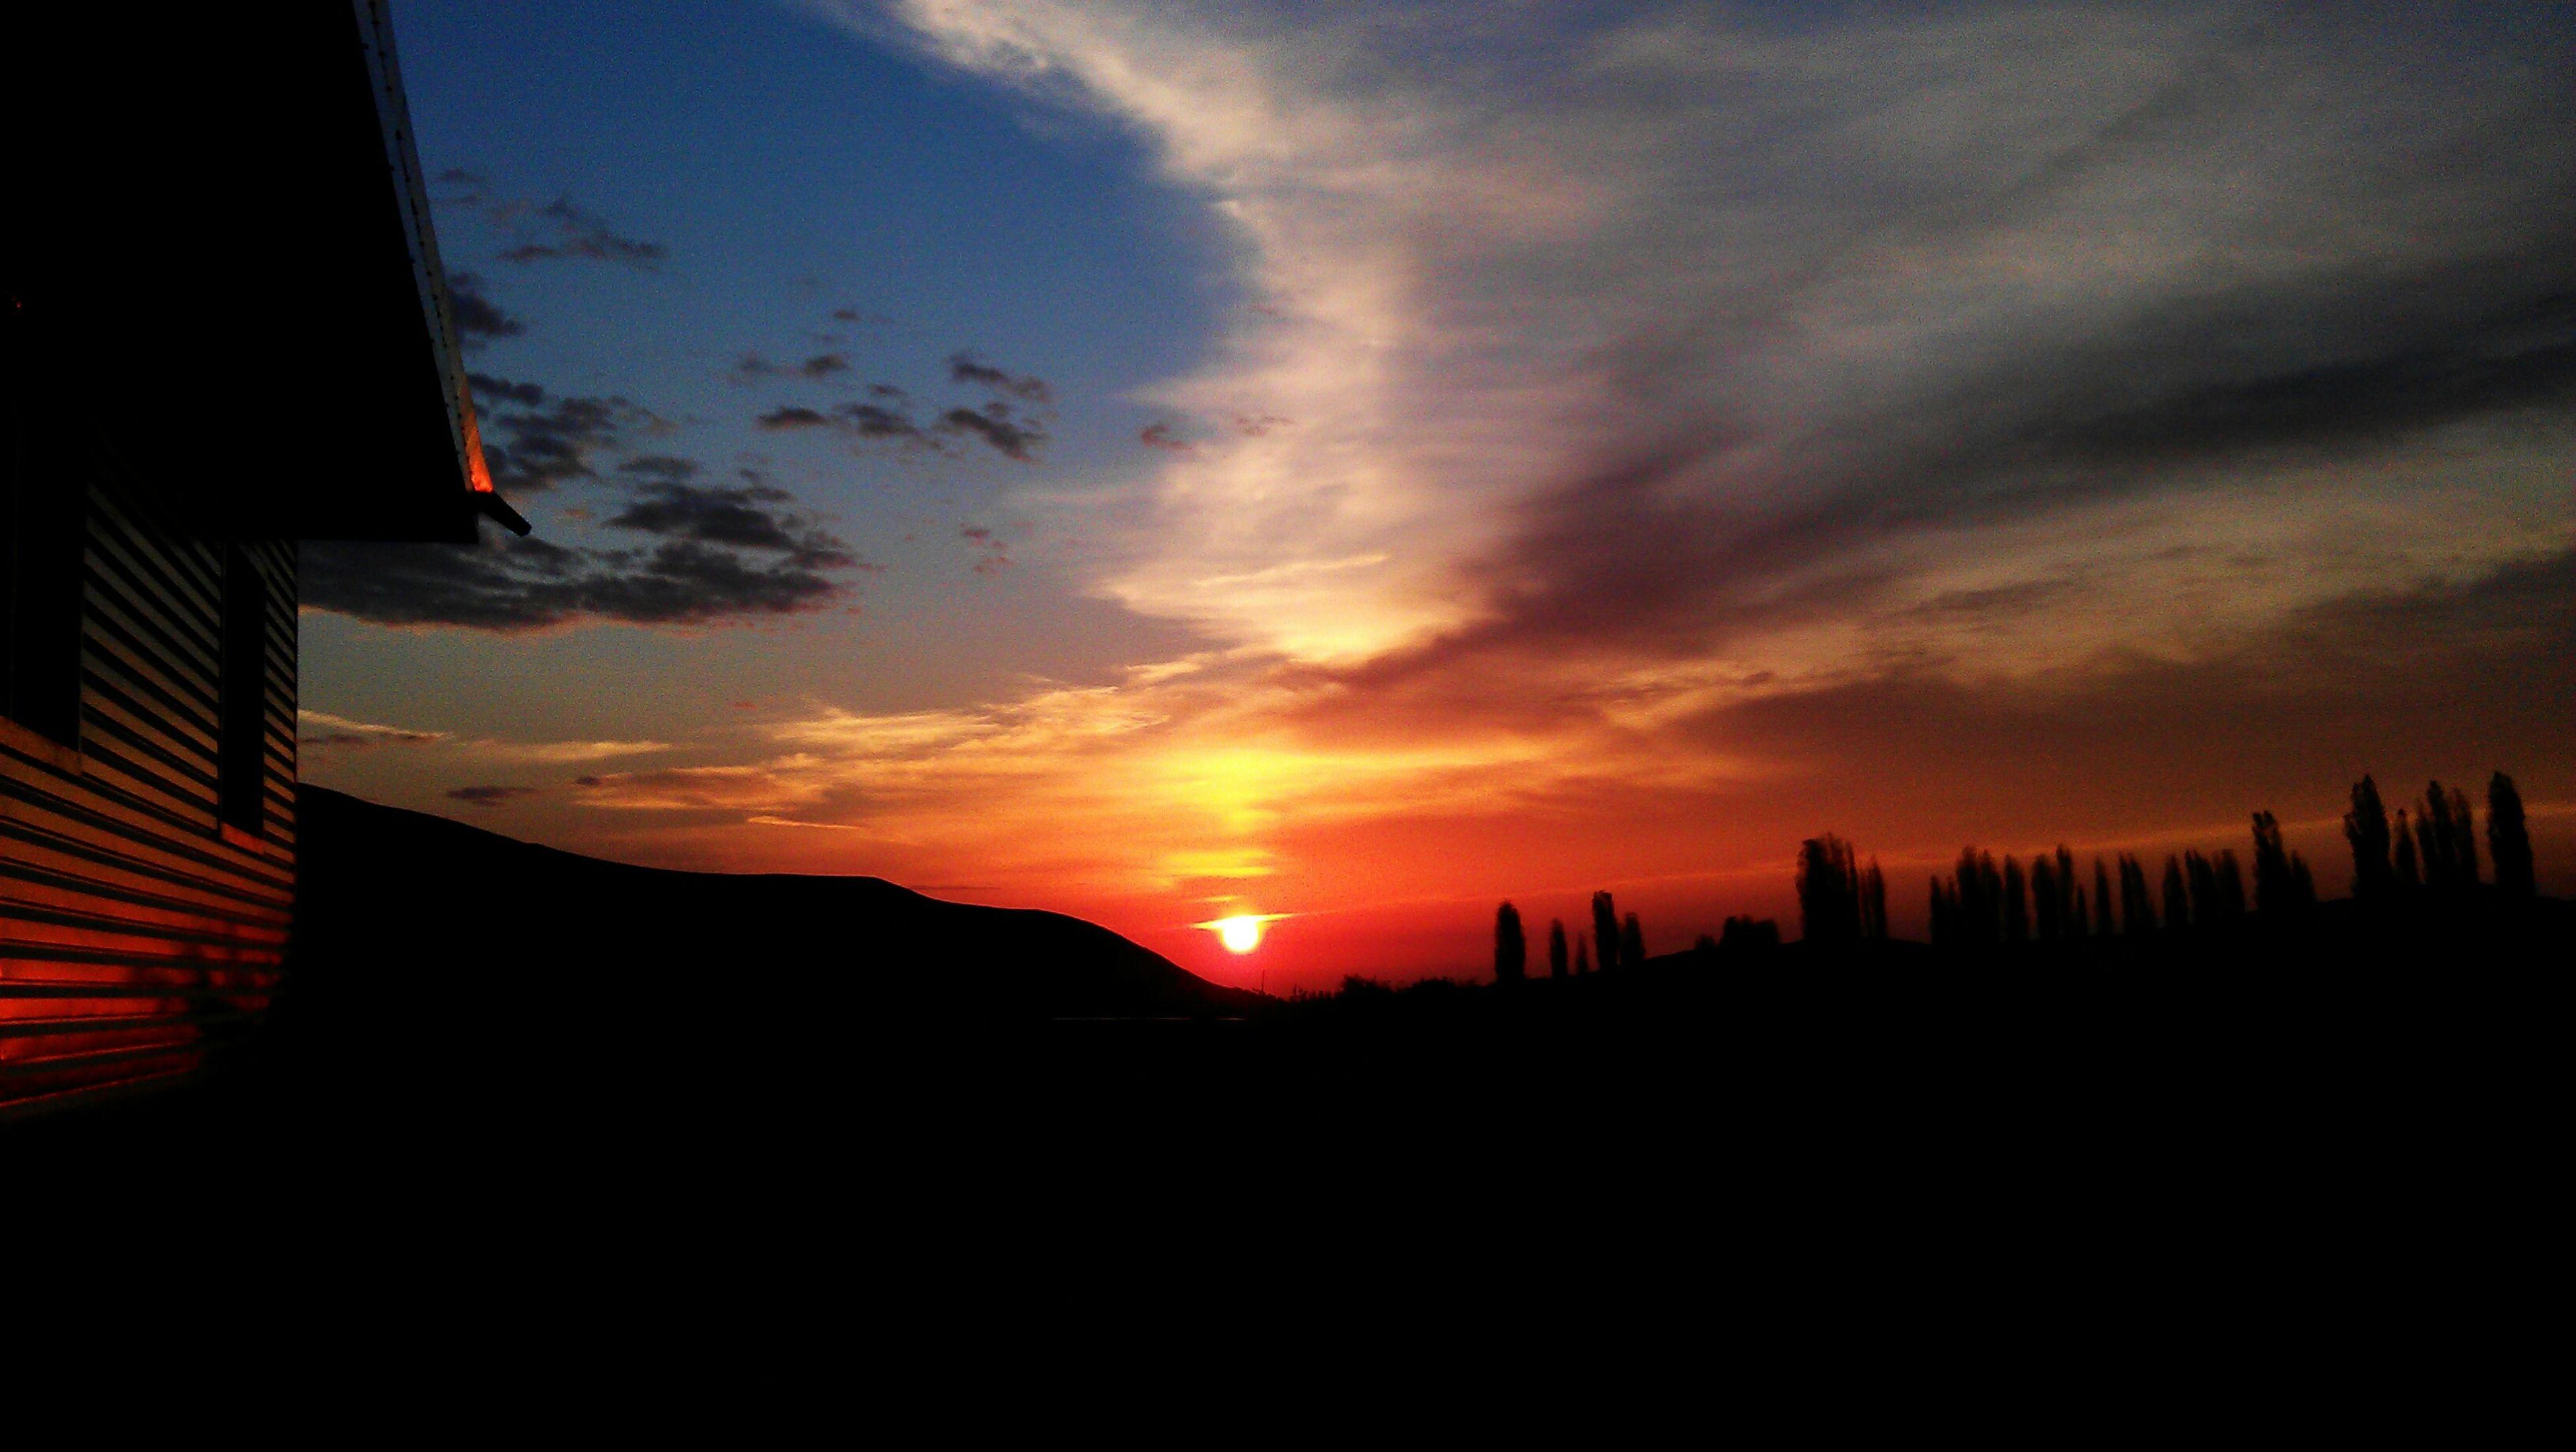 sunset, silhouette, orange color, sun, sky, scenics, beauty in nature, tranquil scene, cloud - sky, idyllic, tranquility, built structure, building exterior, nature, dramatic sky, dark, architecture, sunlight, landscape, cloud